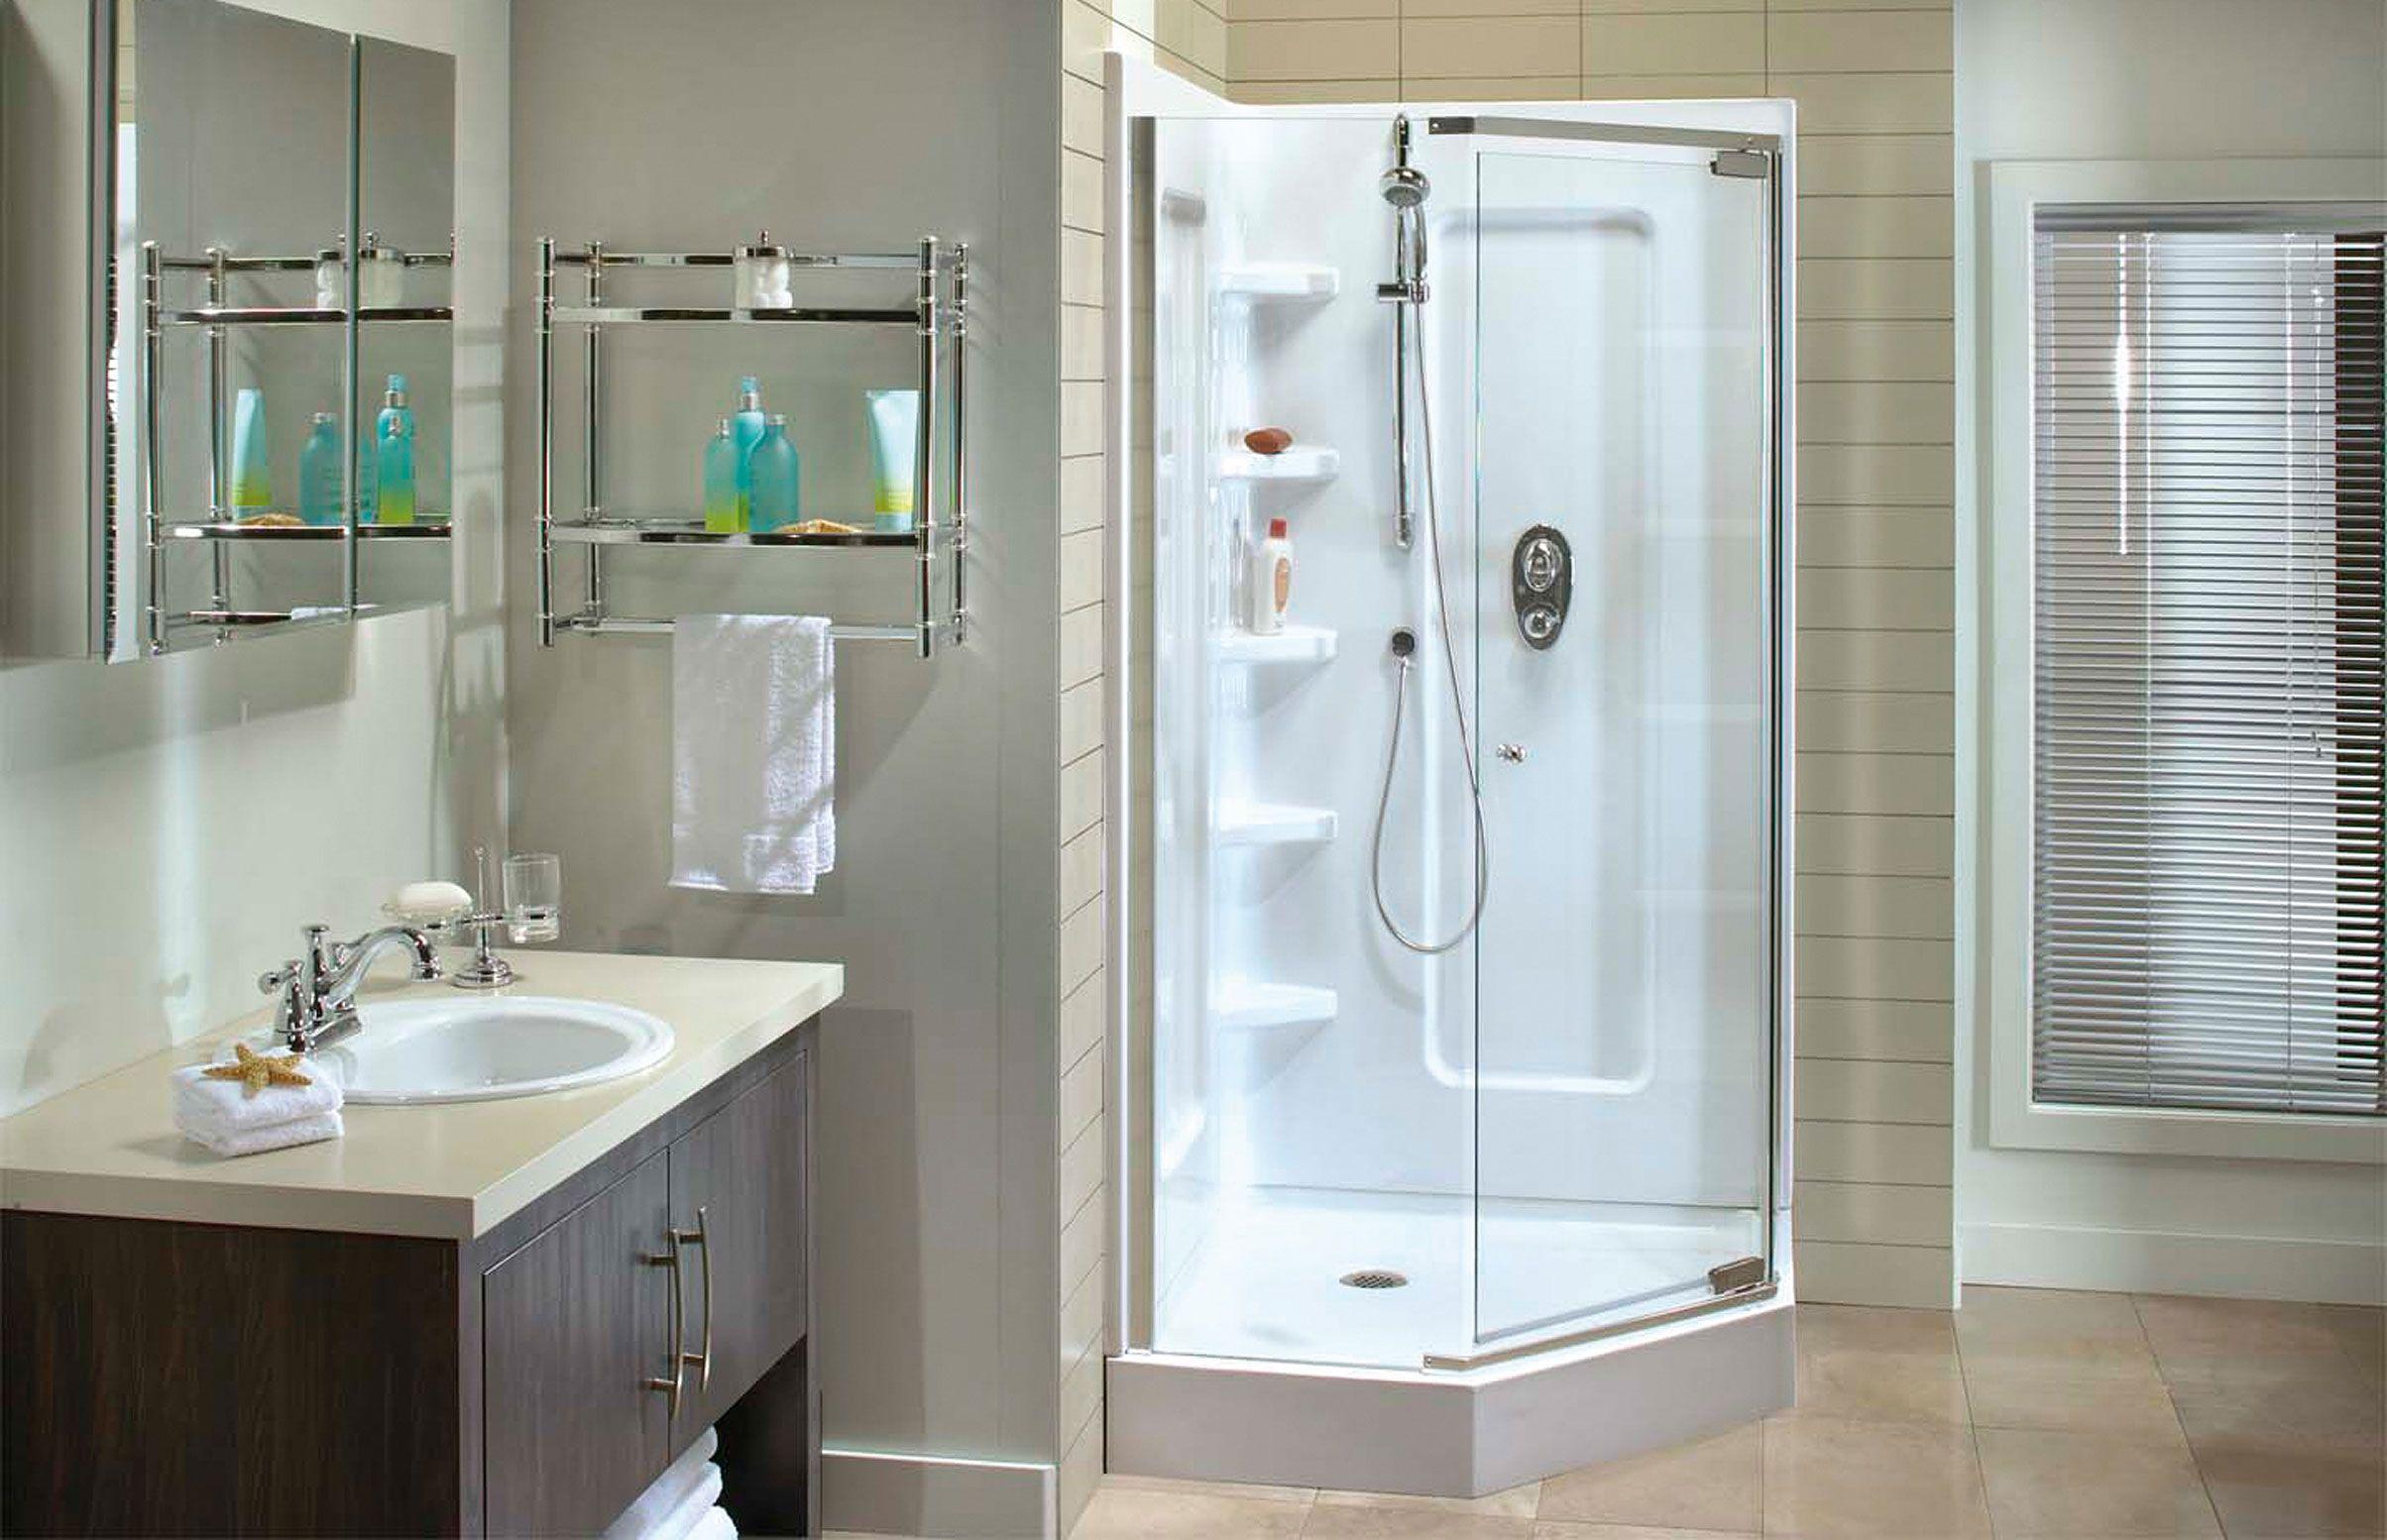 Magnolia Angle Corner shower - Keystone by MAAX | Recipes to try ...